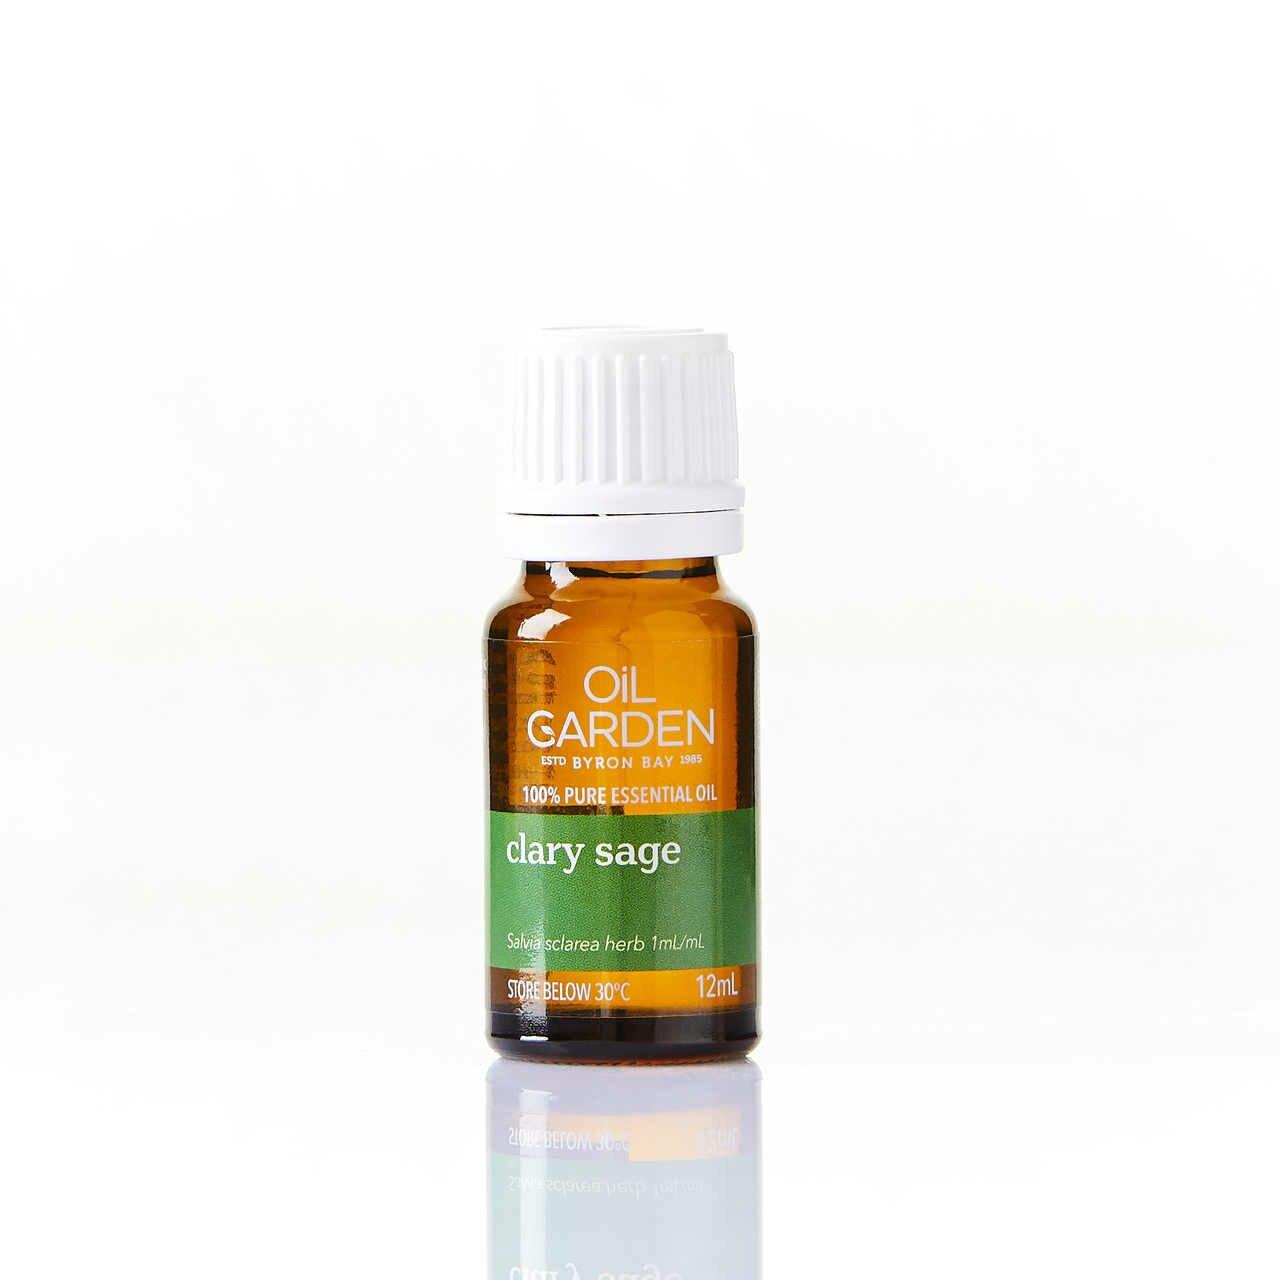 Oil Garden Clary Sage Pure Essential Oil 12mL 6620035